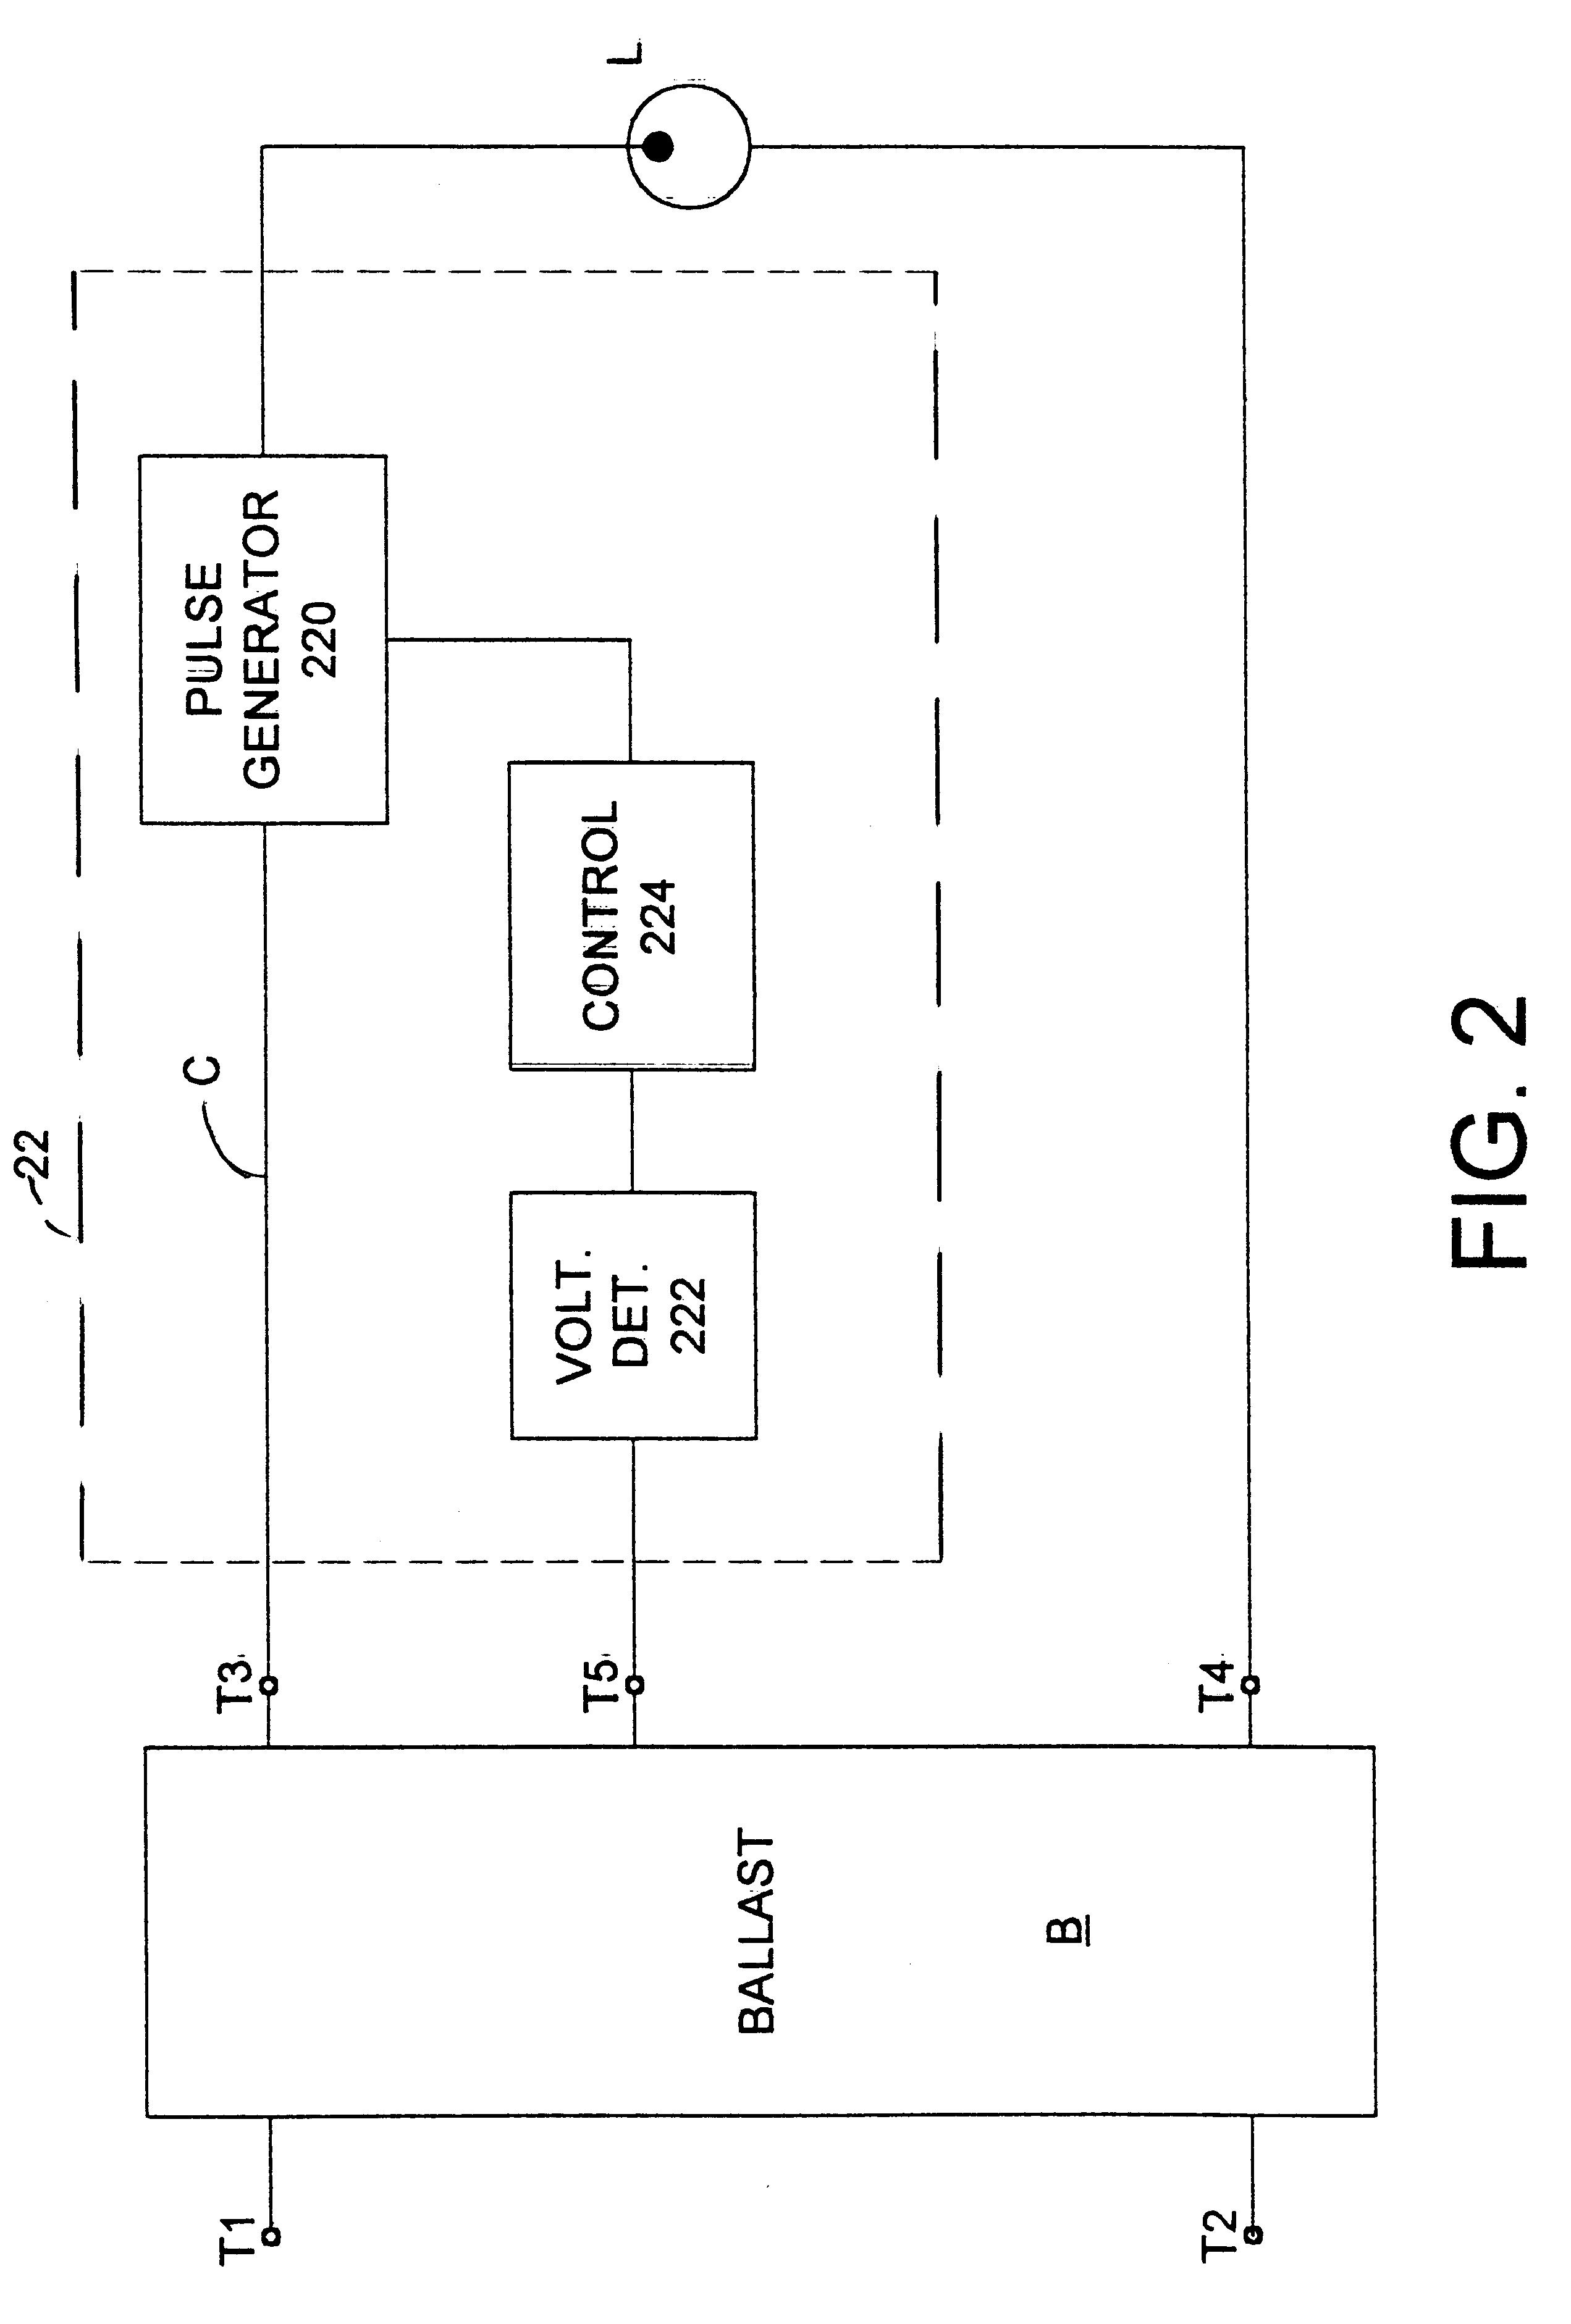 S54 Advance Ballast Wiring Diagram Download Diagrams T12 Gmc C6500 Electronic